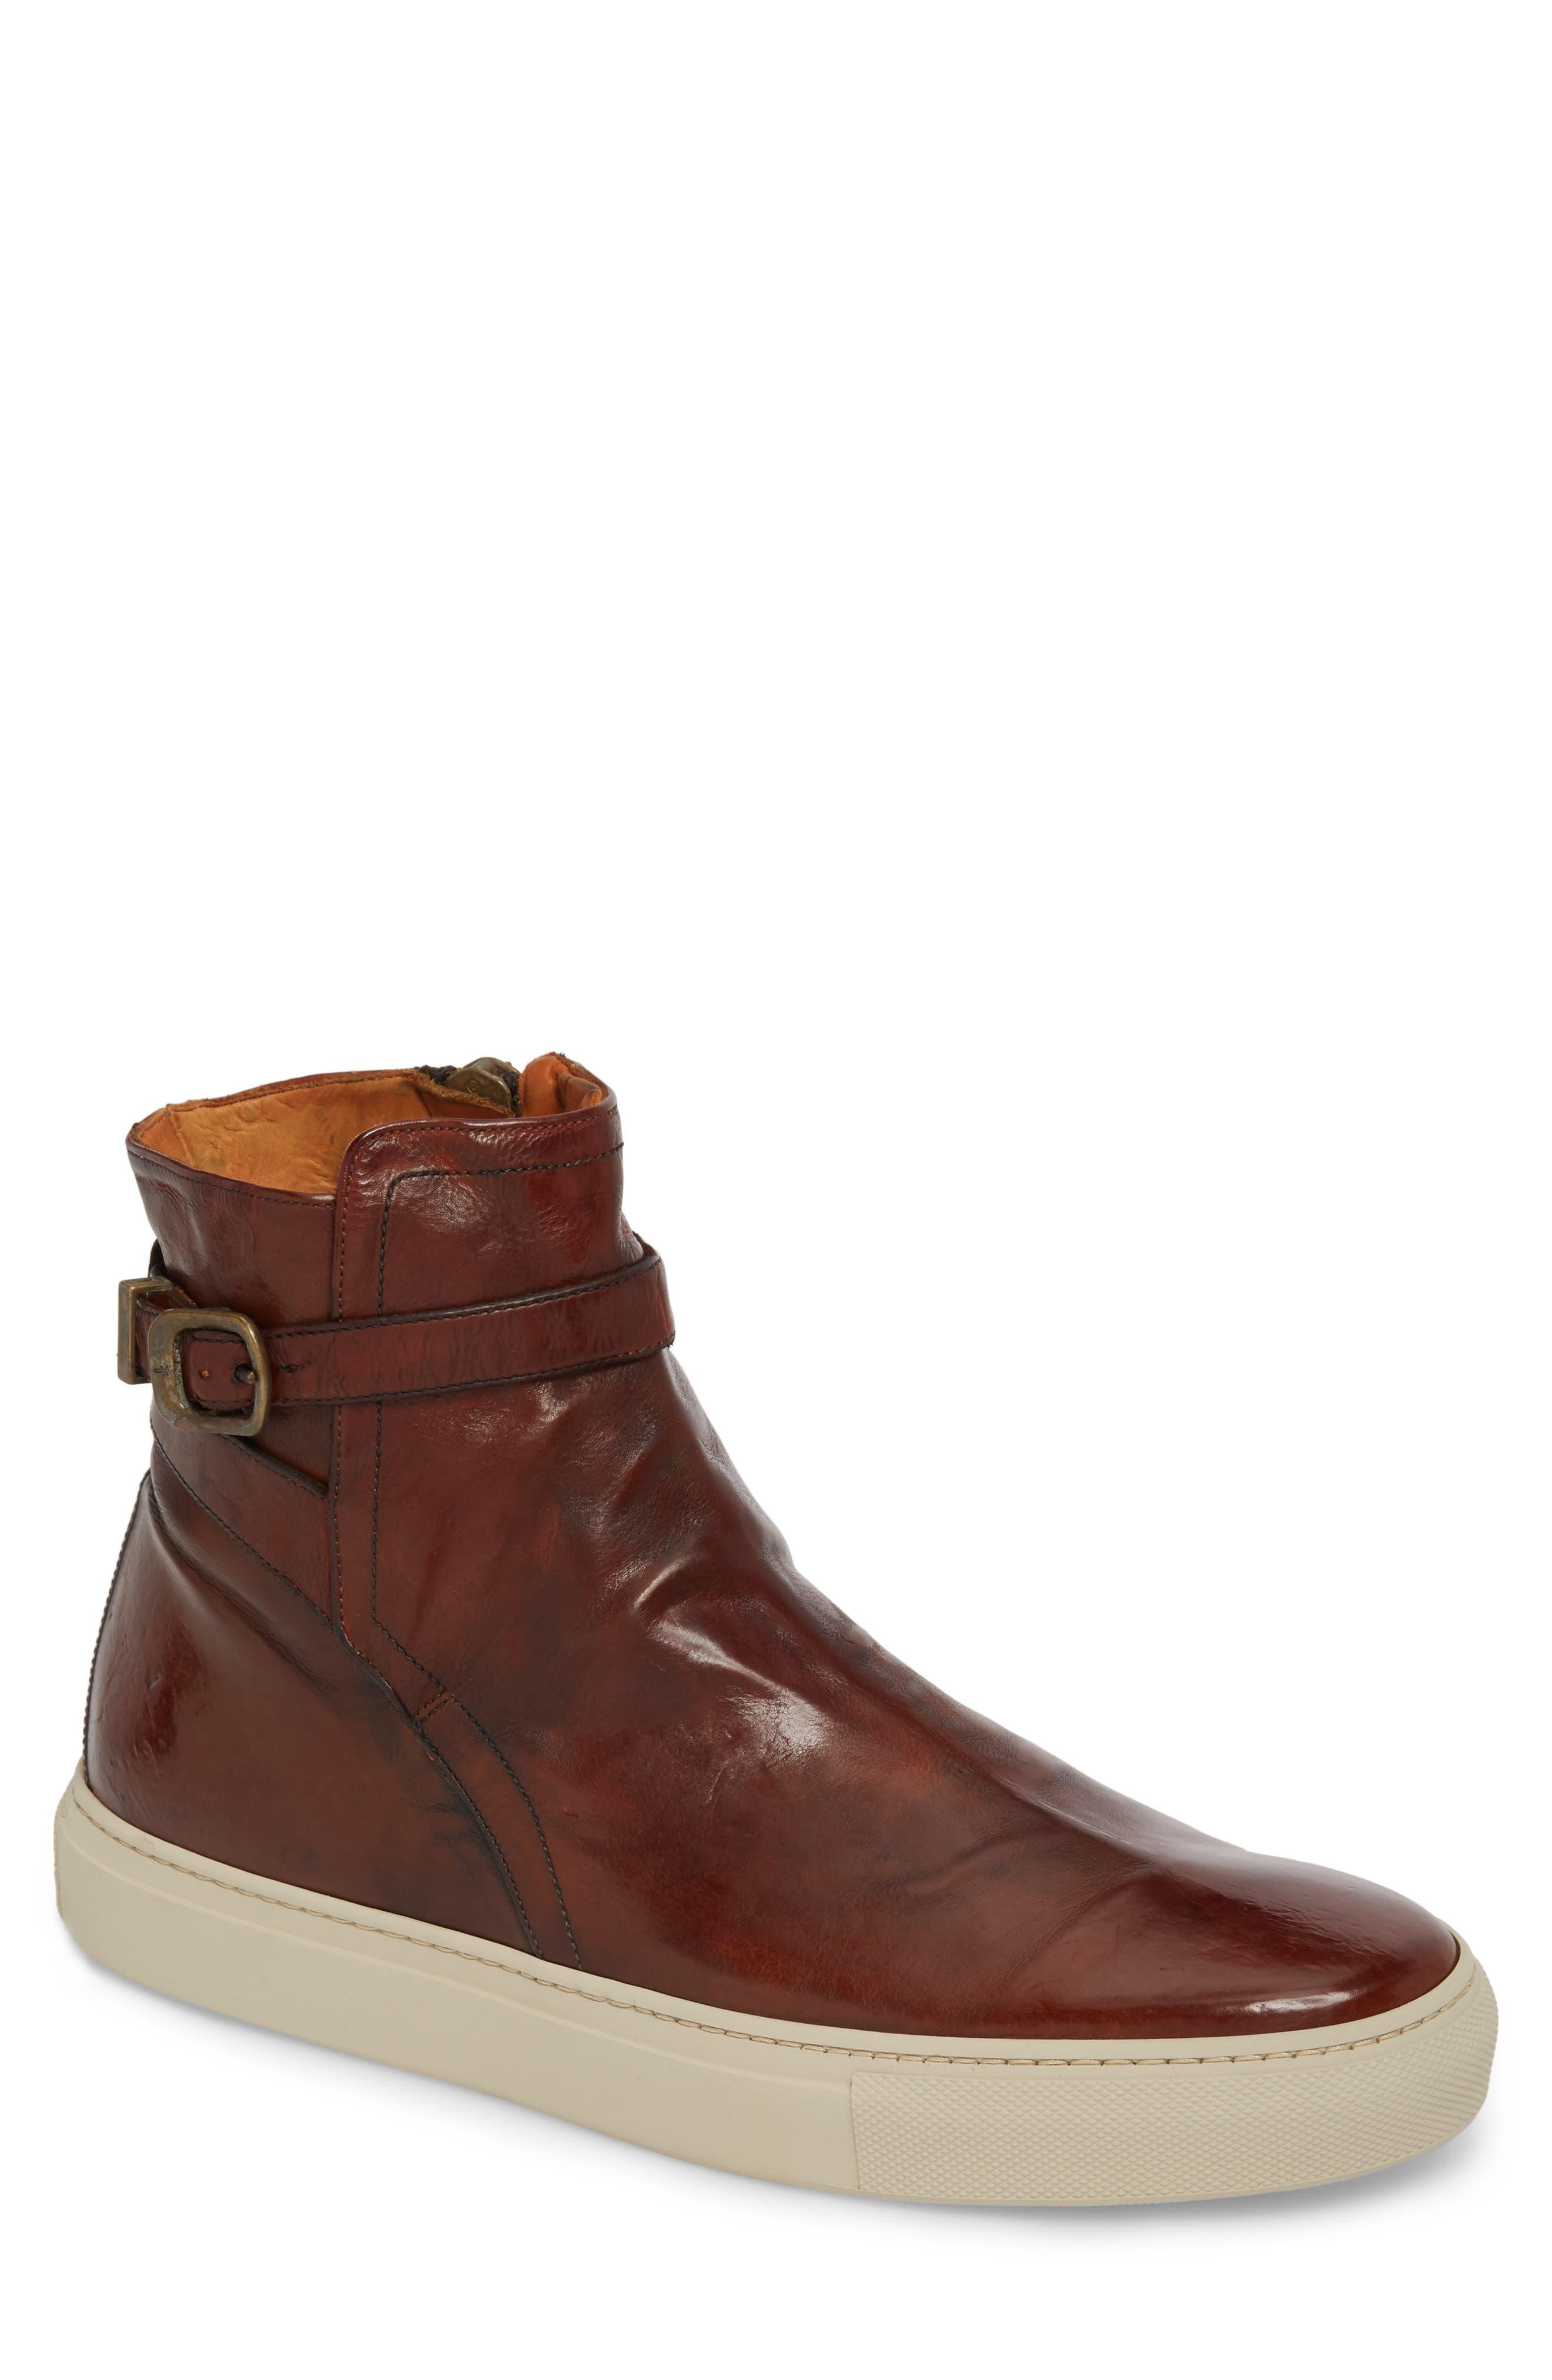 Owen Jodhpur High Top Sneaker,                             Main thumbnail 2, color,